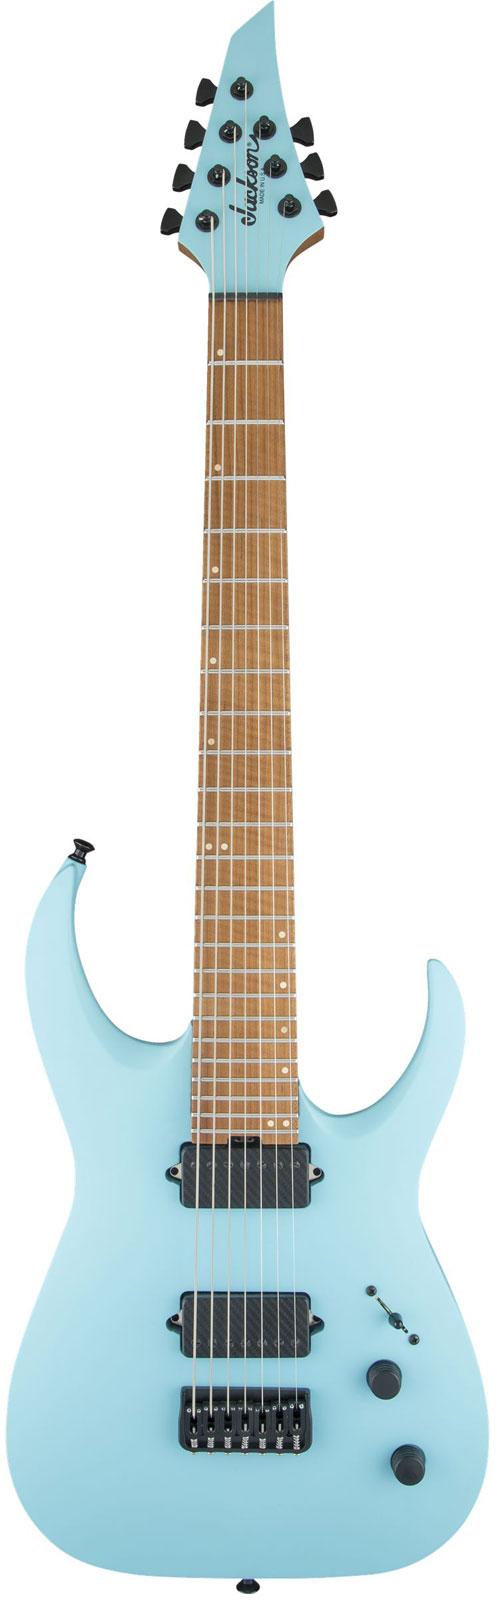 Jackson Guitars Usa Signature Misha Mansoor Juggernaut Ht7 Caramelized Flame Maple Fingerboard Satin Daphne Blue